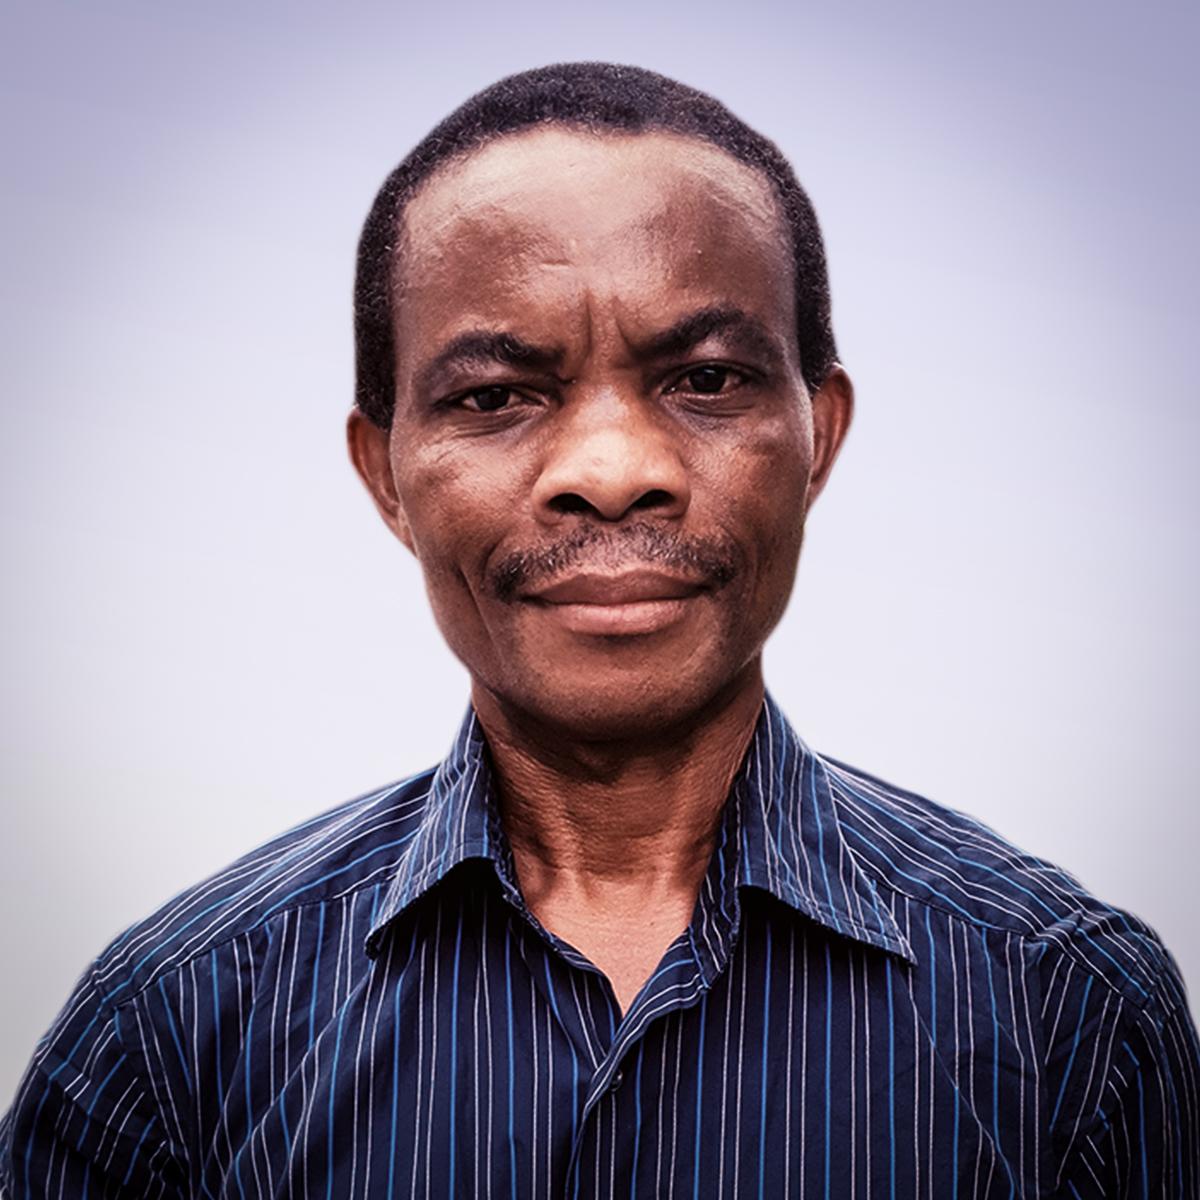 Treasurer nigerian community bayern munich